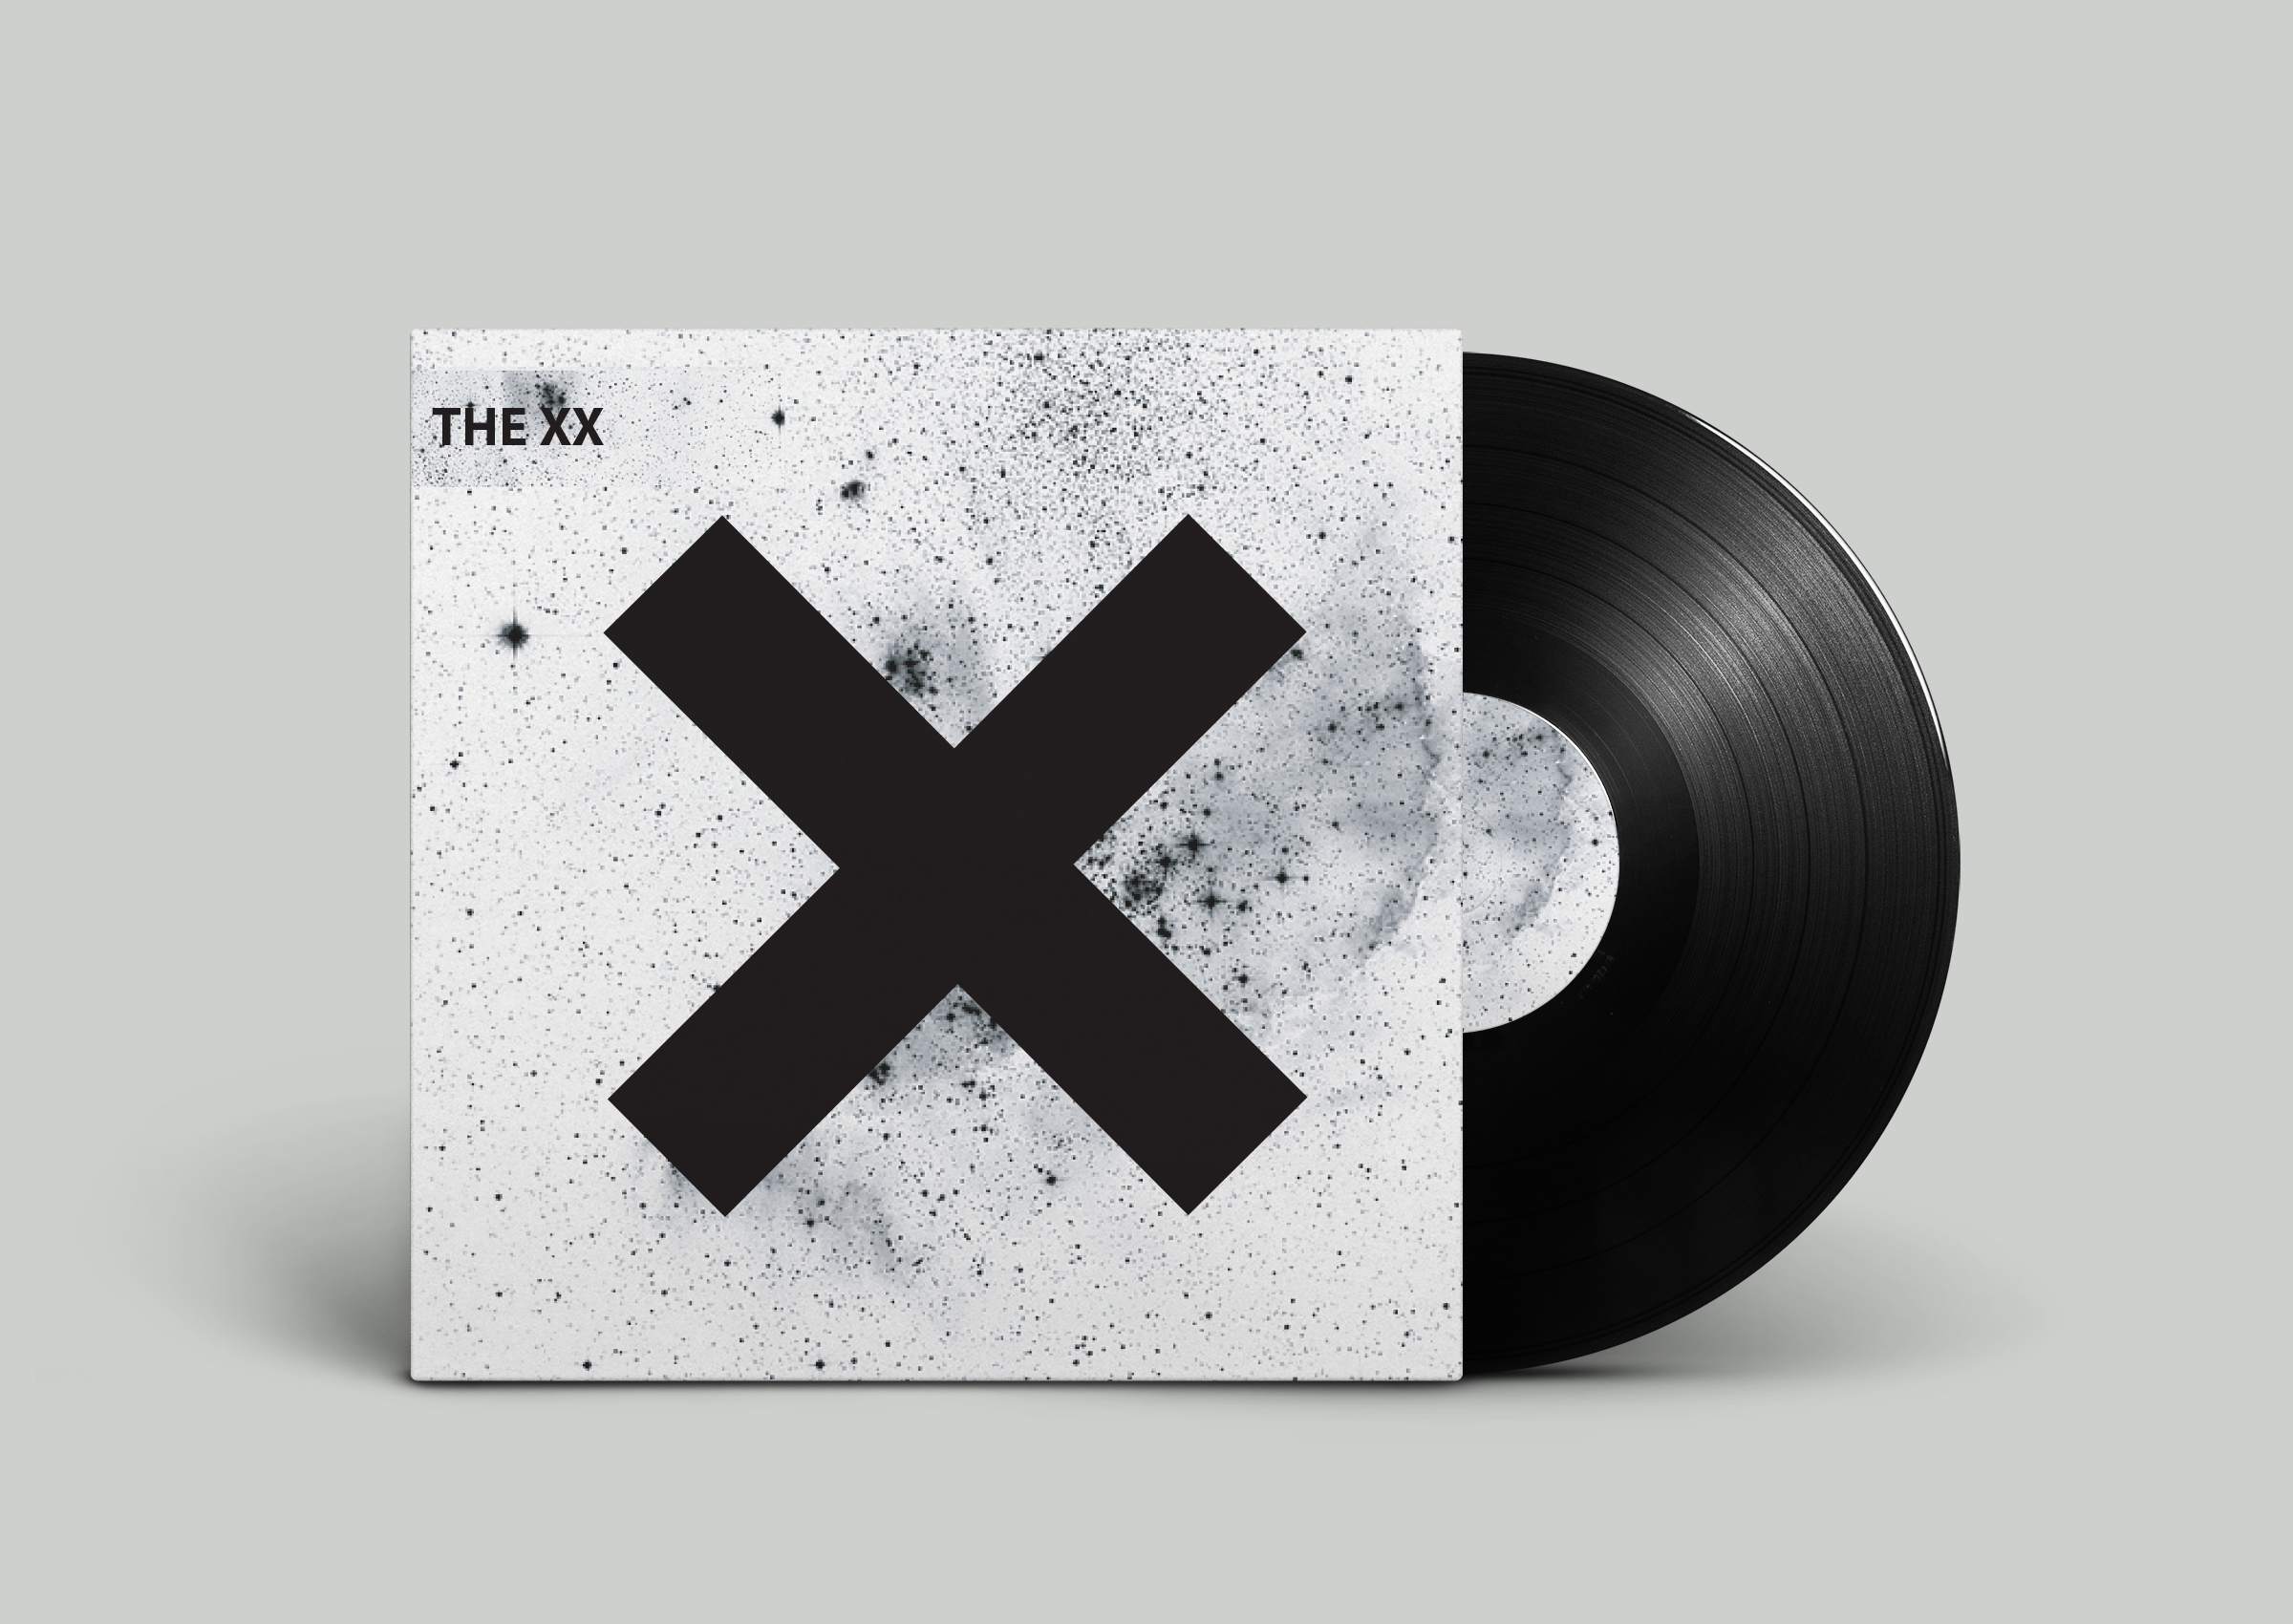 The+XX+Album.png